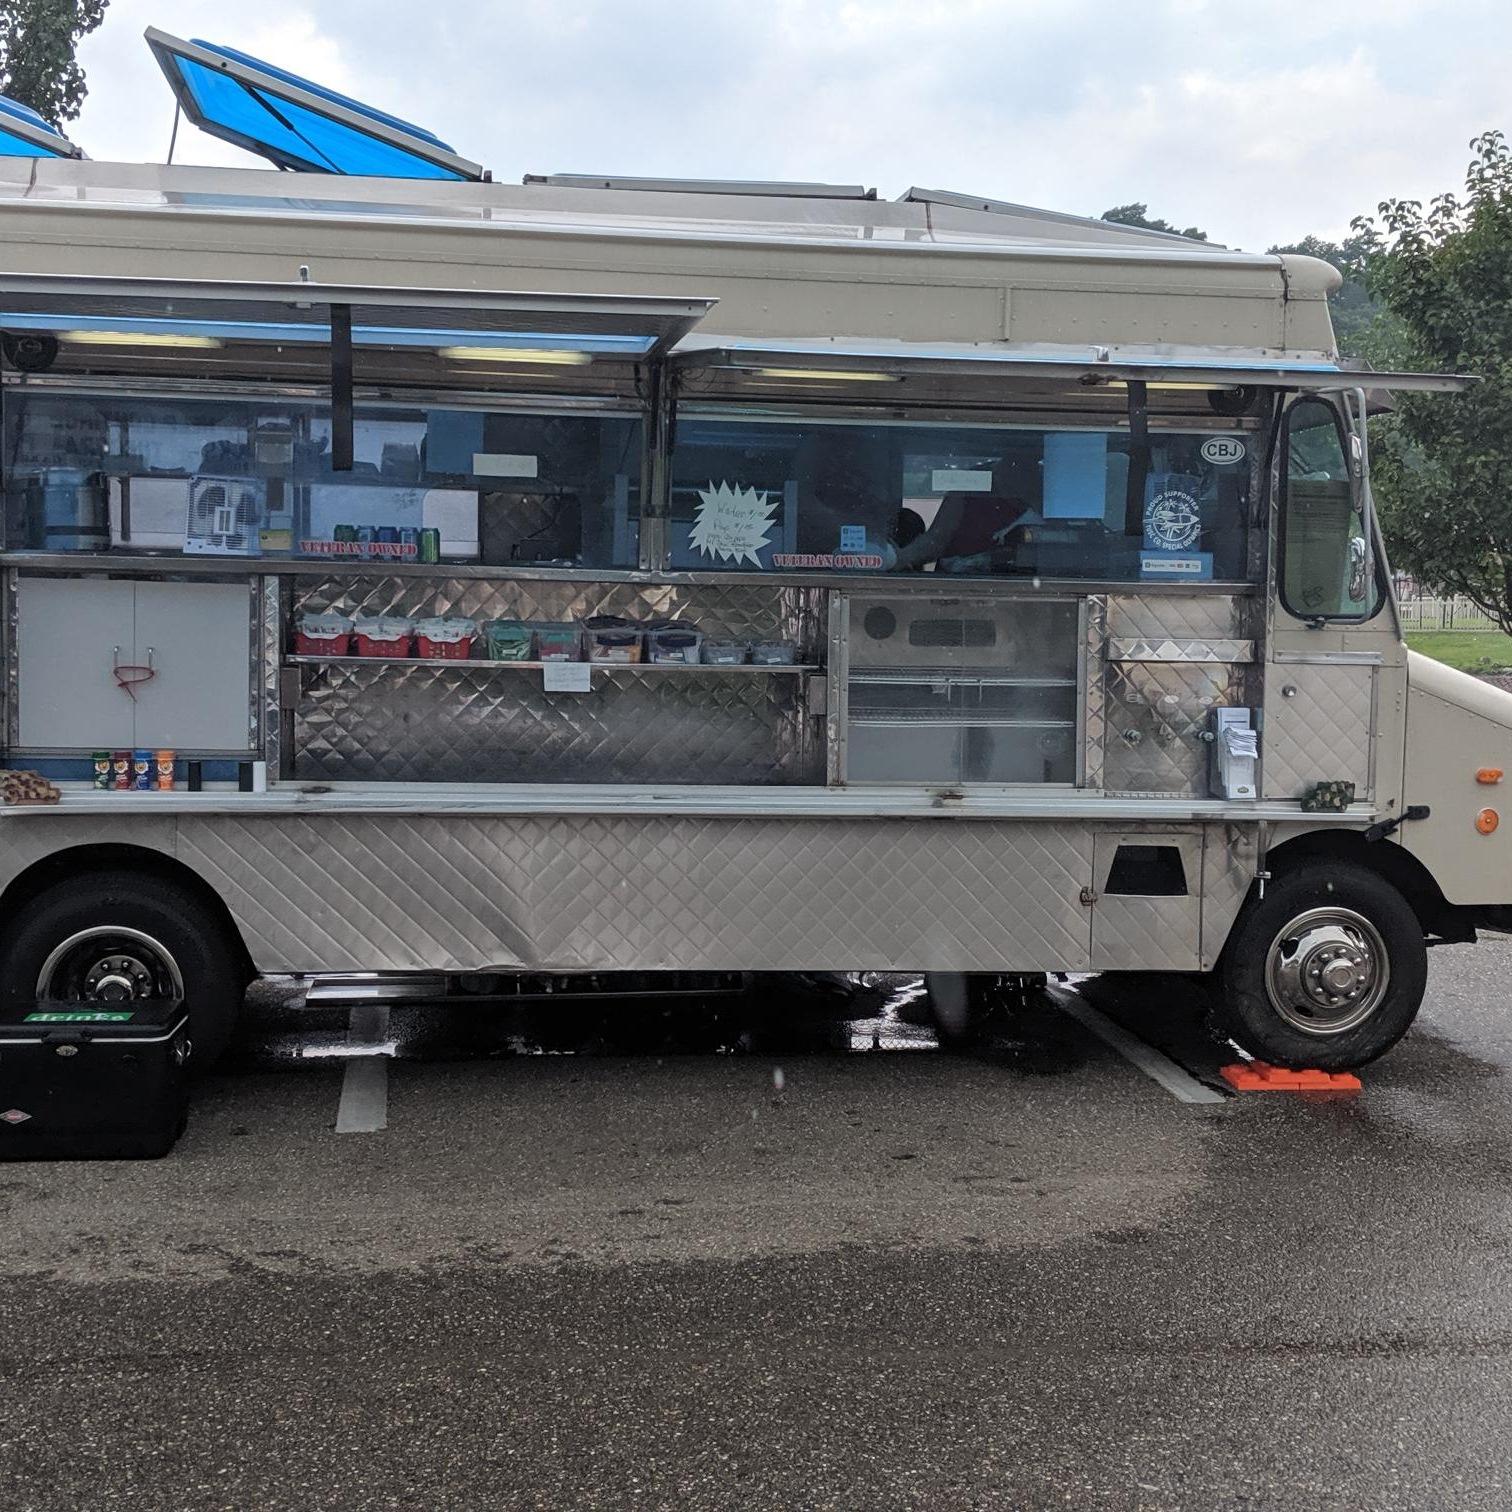 Messdad's Concession food truck profile image